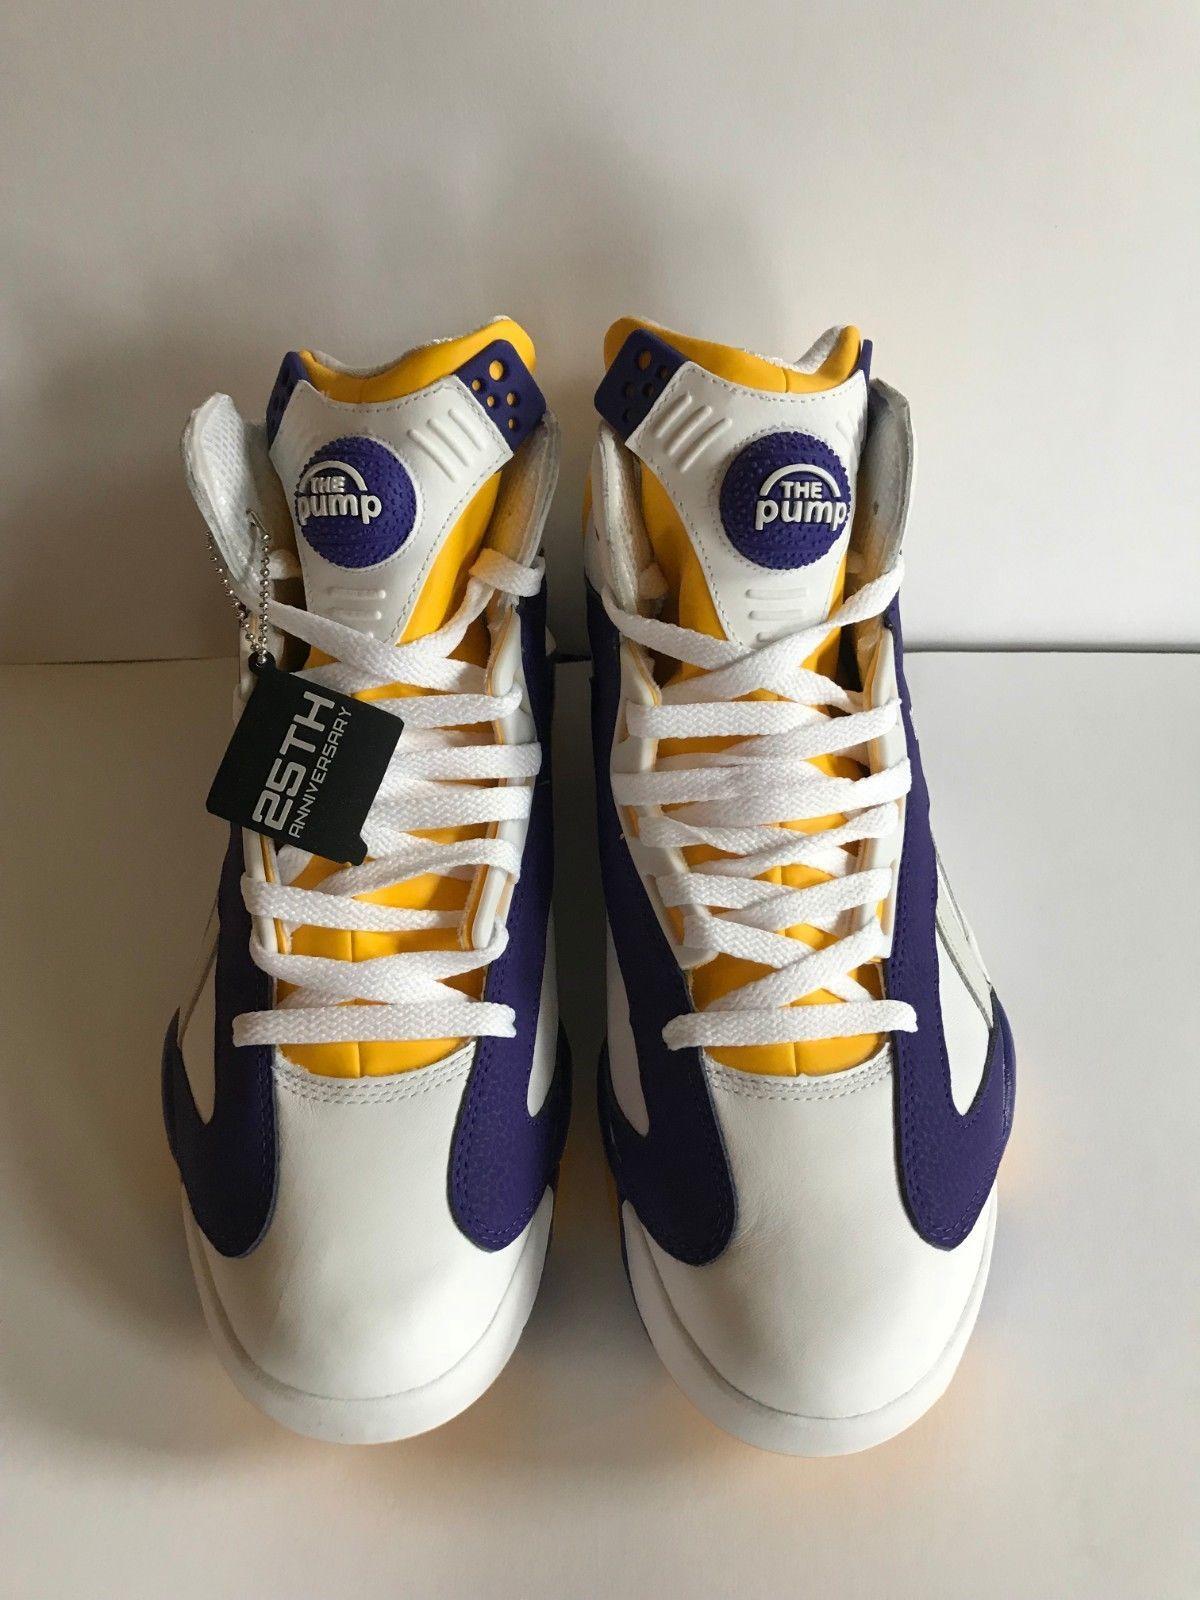 93858feae00 Details about REEBOK SHAQ ATTAQ Pump ALMA MATER LSU Tigers Sneaker ...